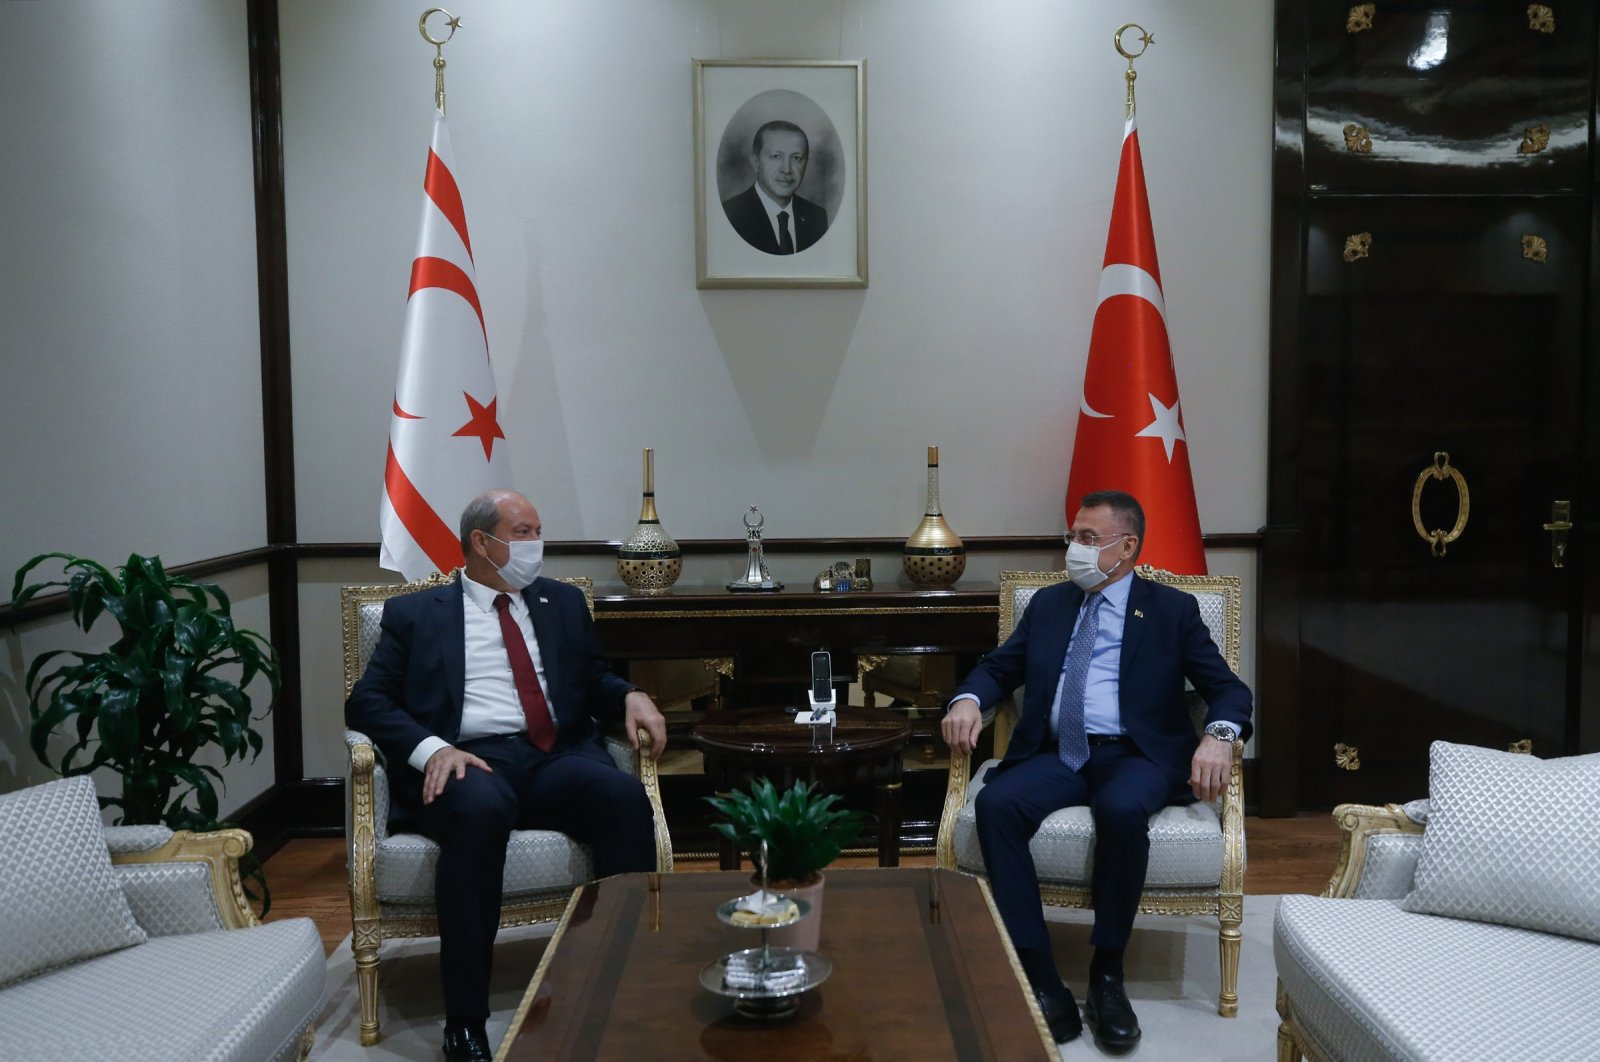 Vice President Fuat Oktay (R) hosts the Turkish Republic of Northern Cyprus (TRNC) Prime Minister Ersin Tatar in the capital Ankara, Sept. 29, 2020. (AA Photo)